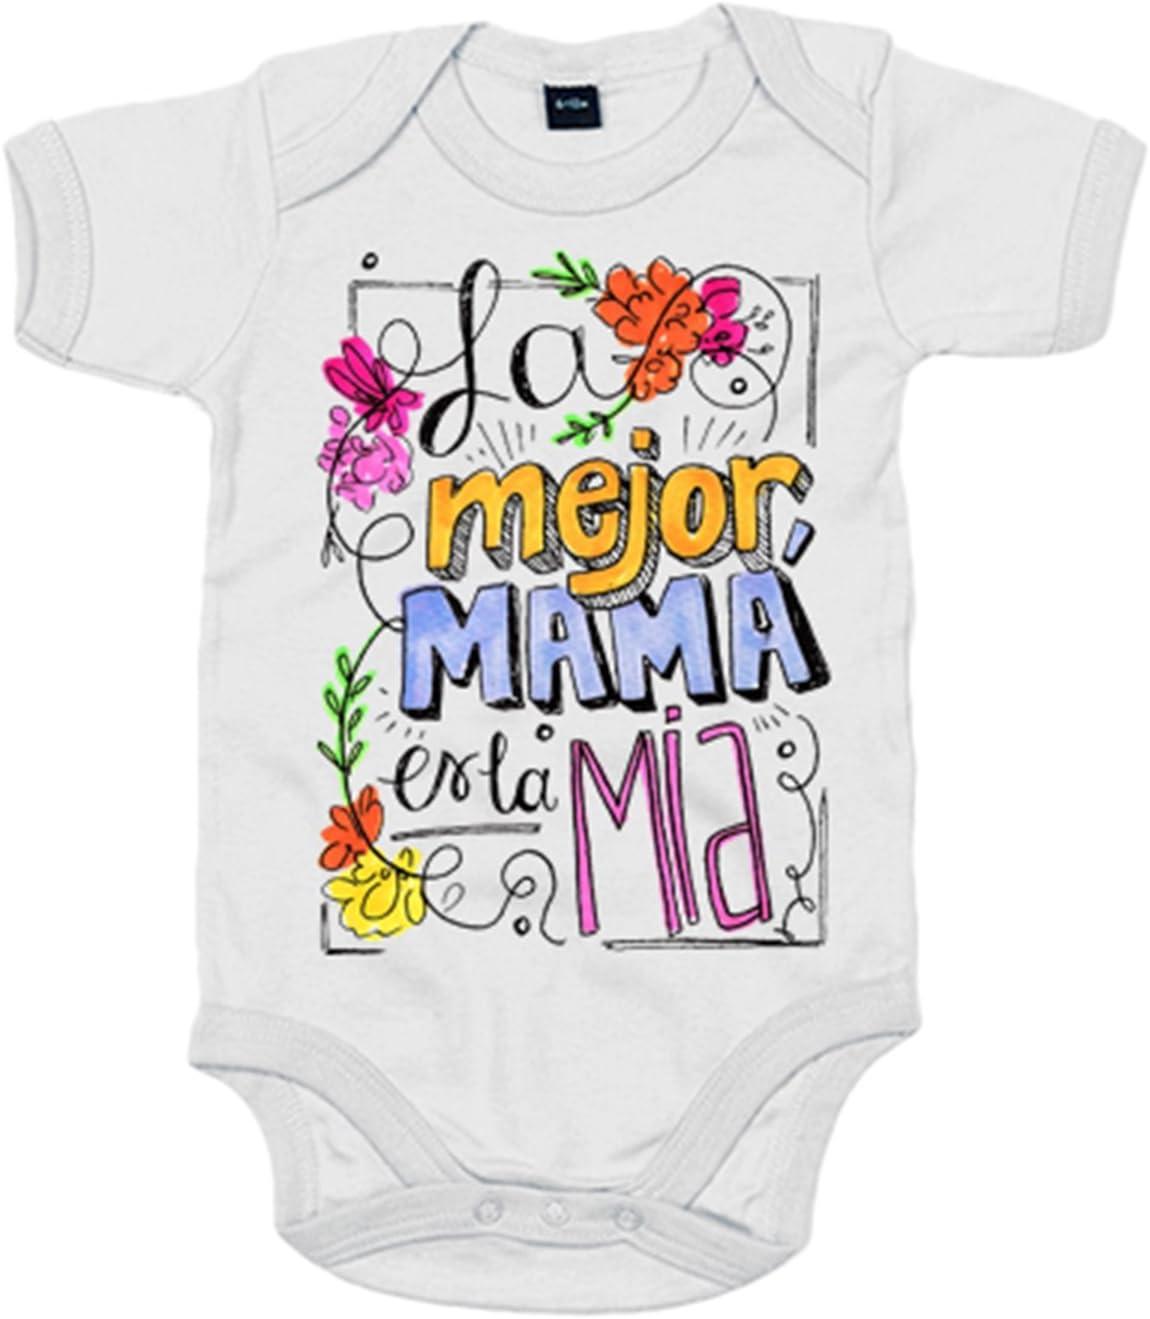 Set Camiseta Madre y Body Manga Corta Beb/é Me and Mini Me Ropa Mama y Bebe Iguales